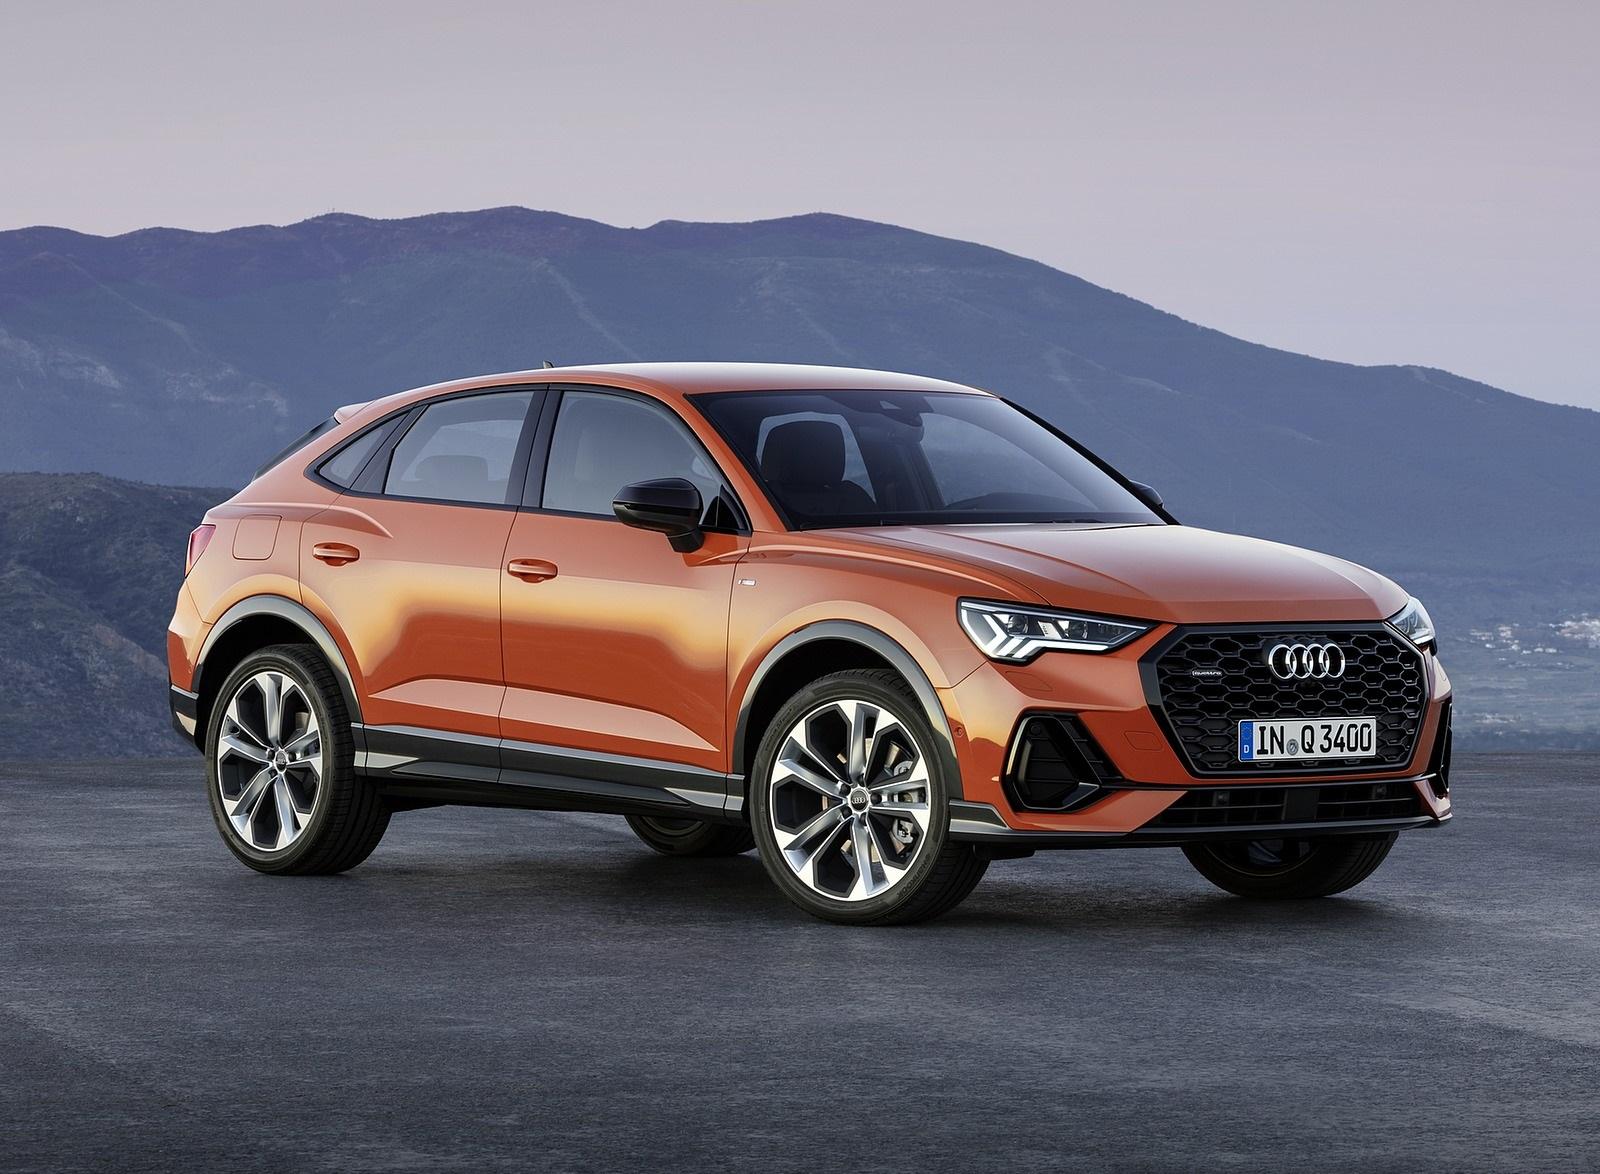 2020 Audi Q3 Sportback S line (Color: Pulse Orange) Front Three-Quarter Wallpapers (5)